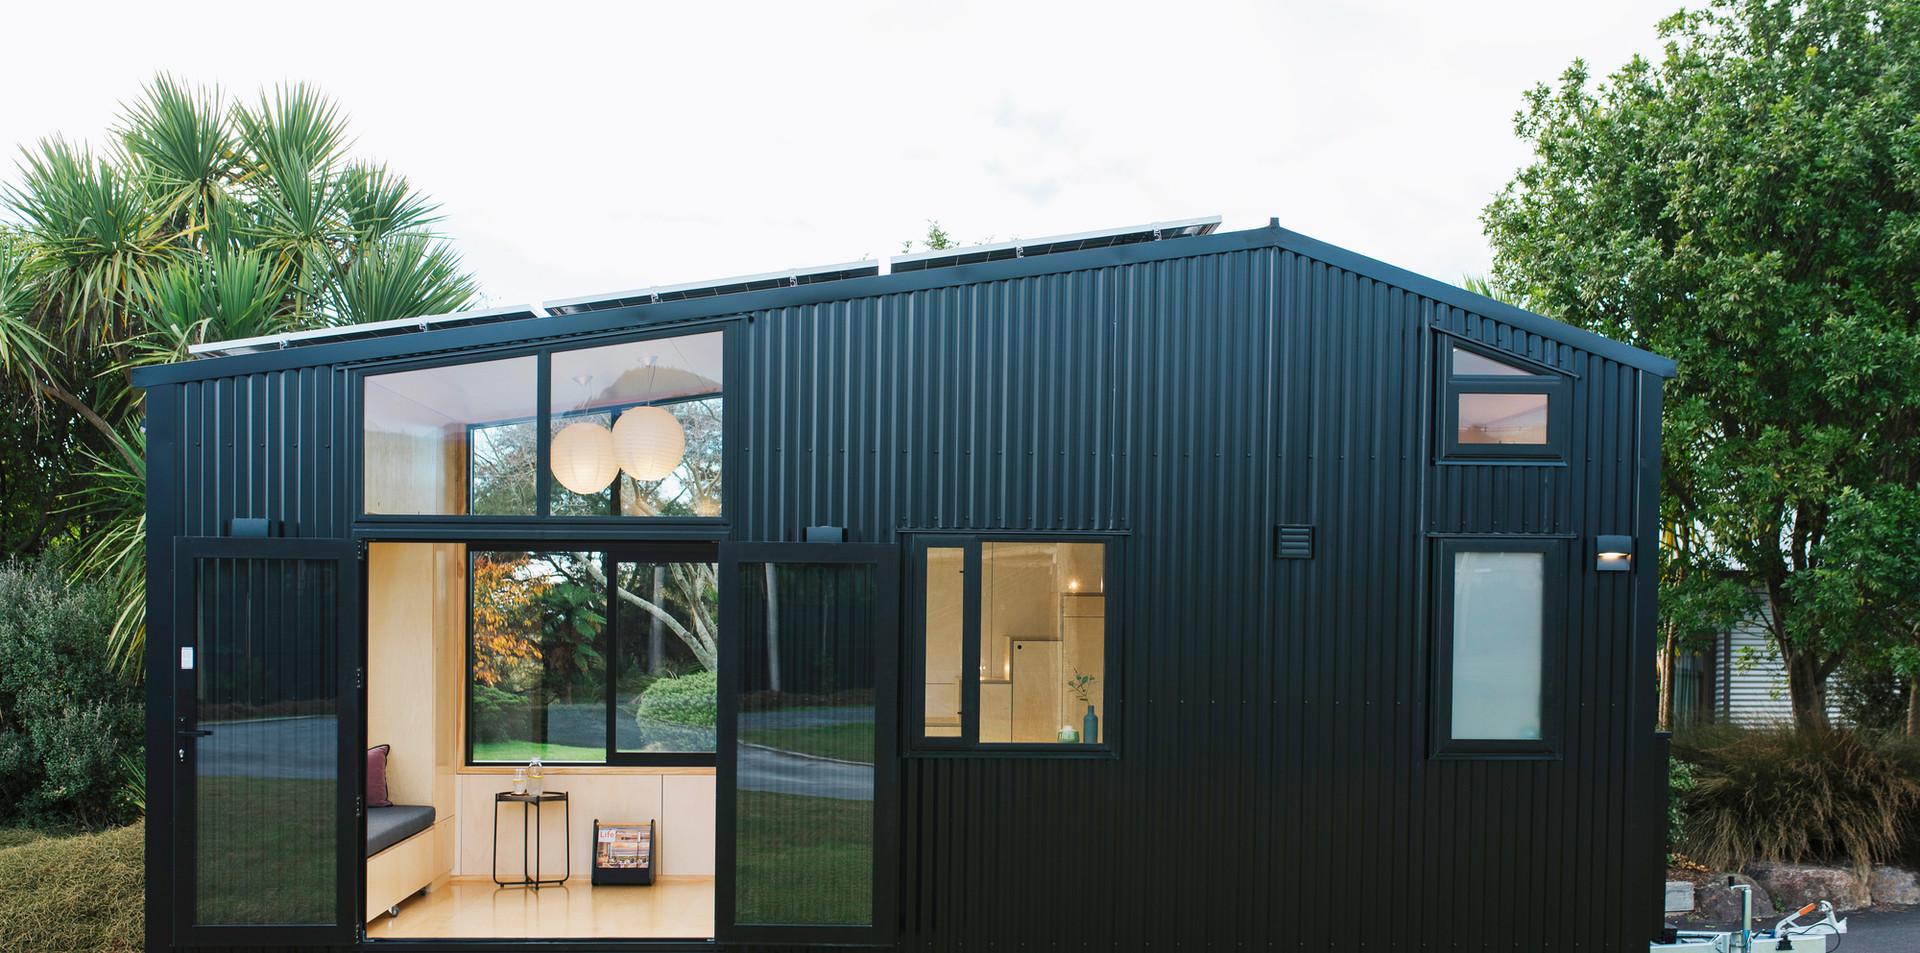 First Light Tiny House